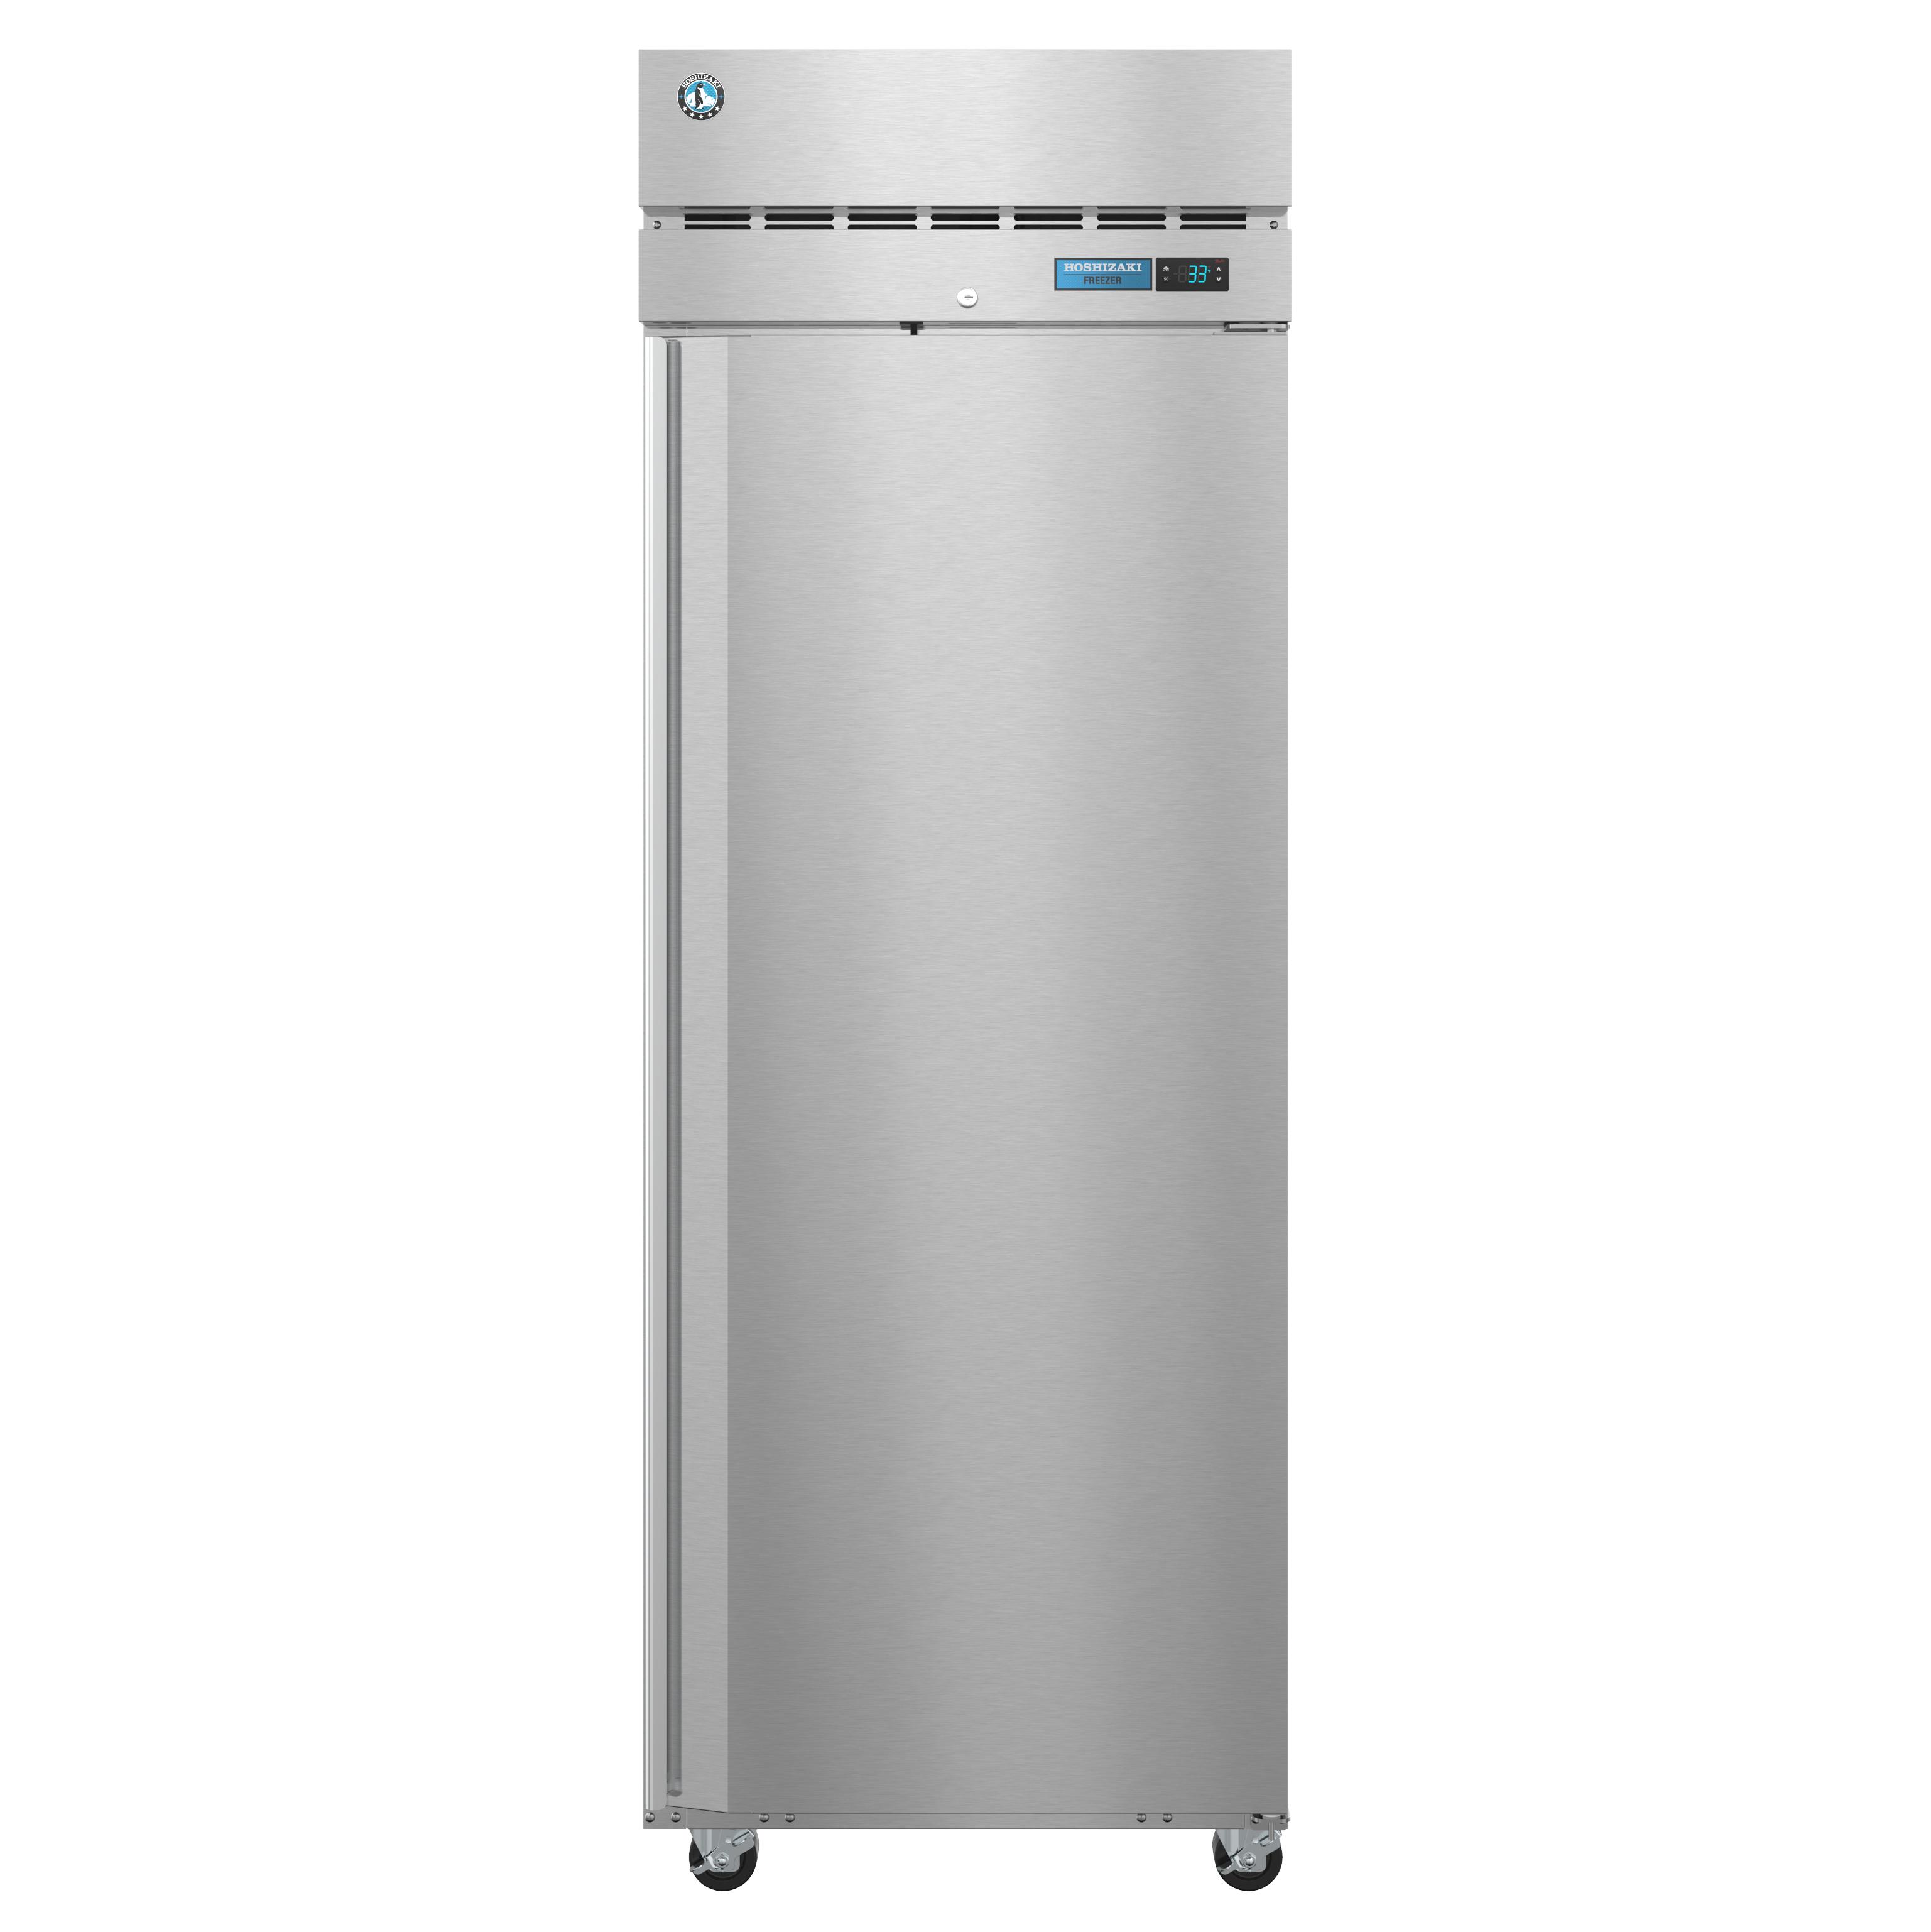 Hoshizaki F1A-FS reach-in refrigerators & freezers